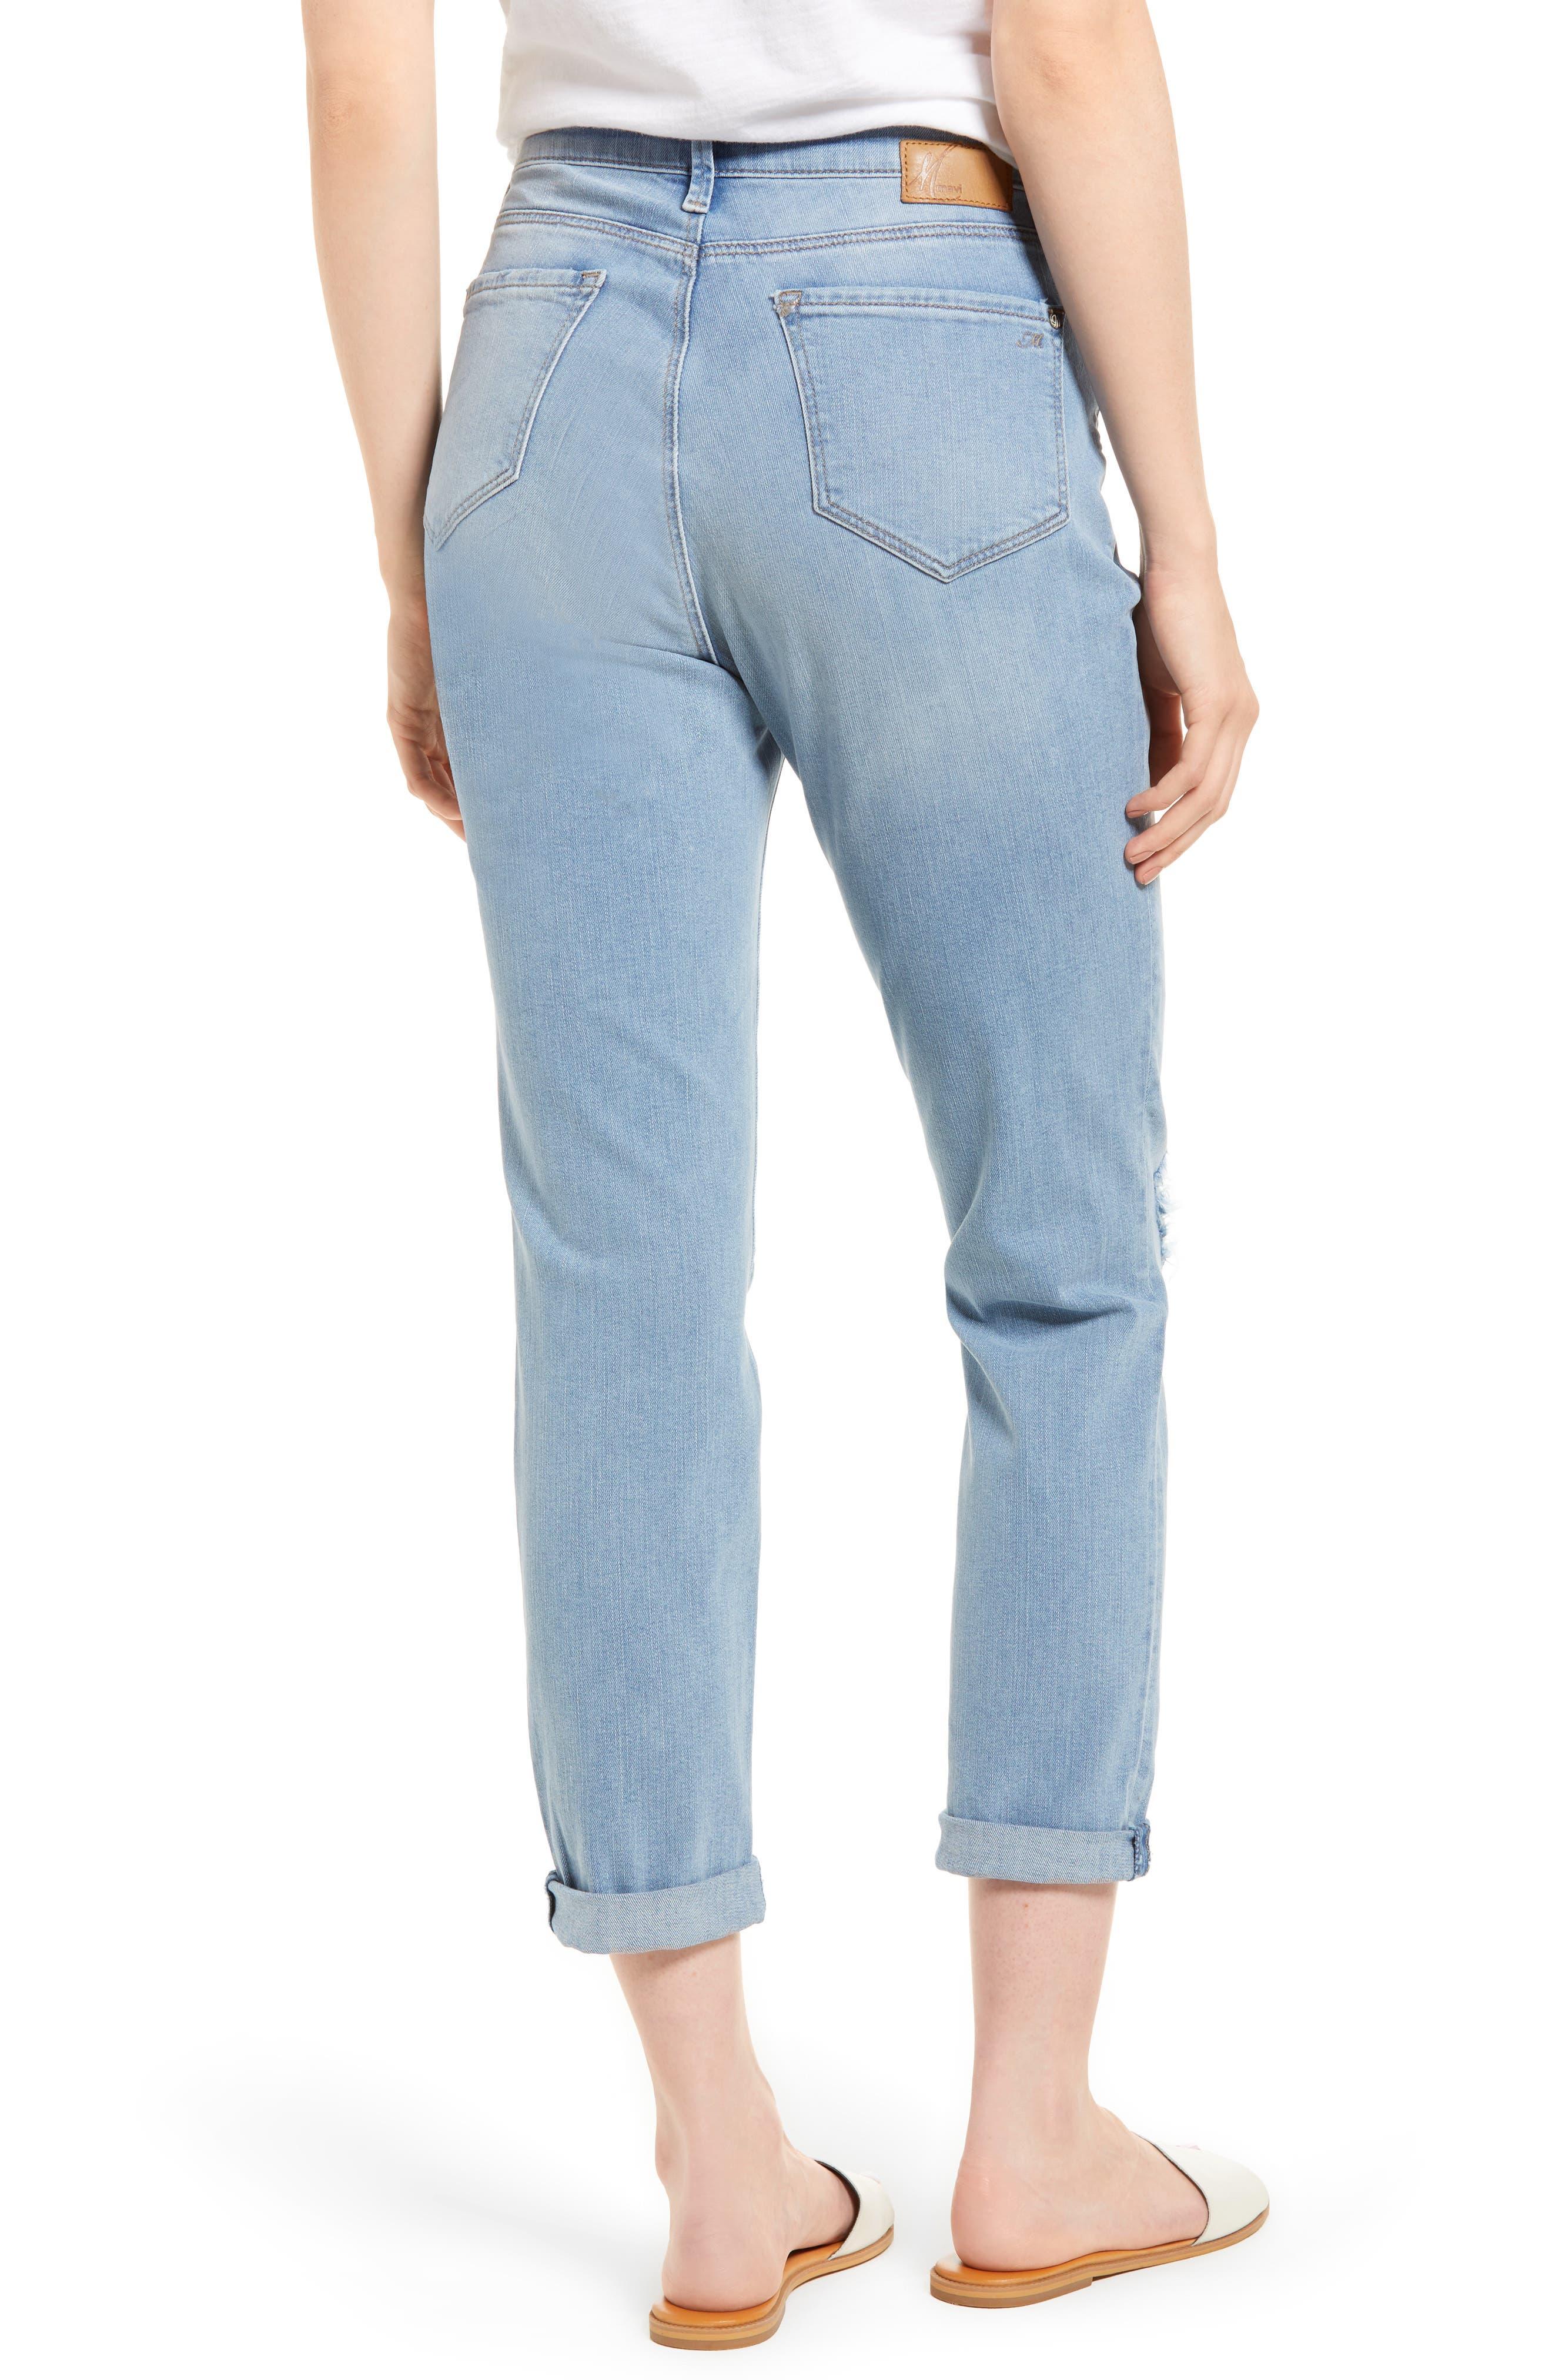 Lea Boyfriend Ripped Jeans,                             Alternate thumbnail 2, color,                             420